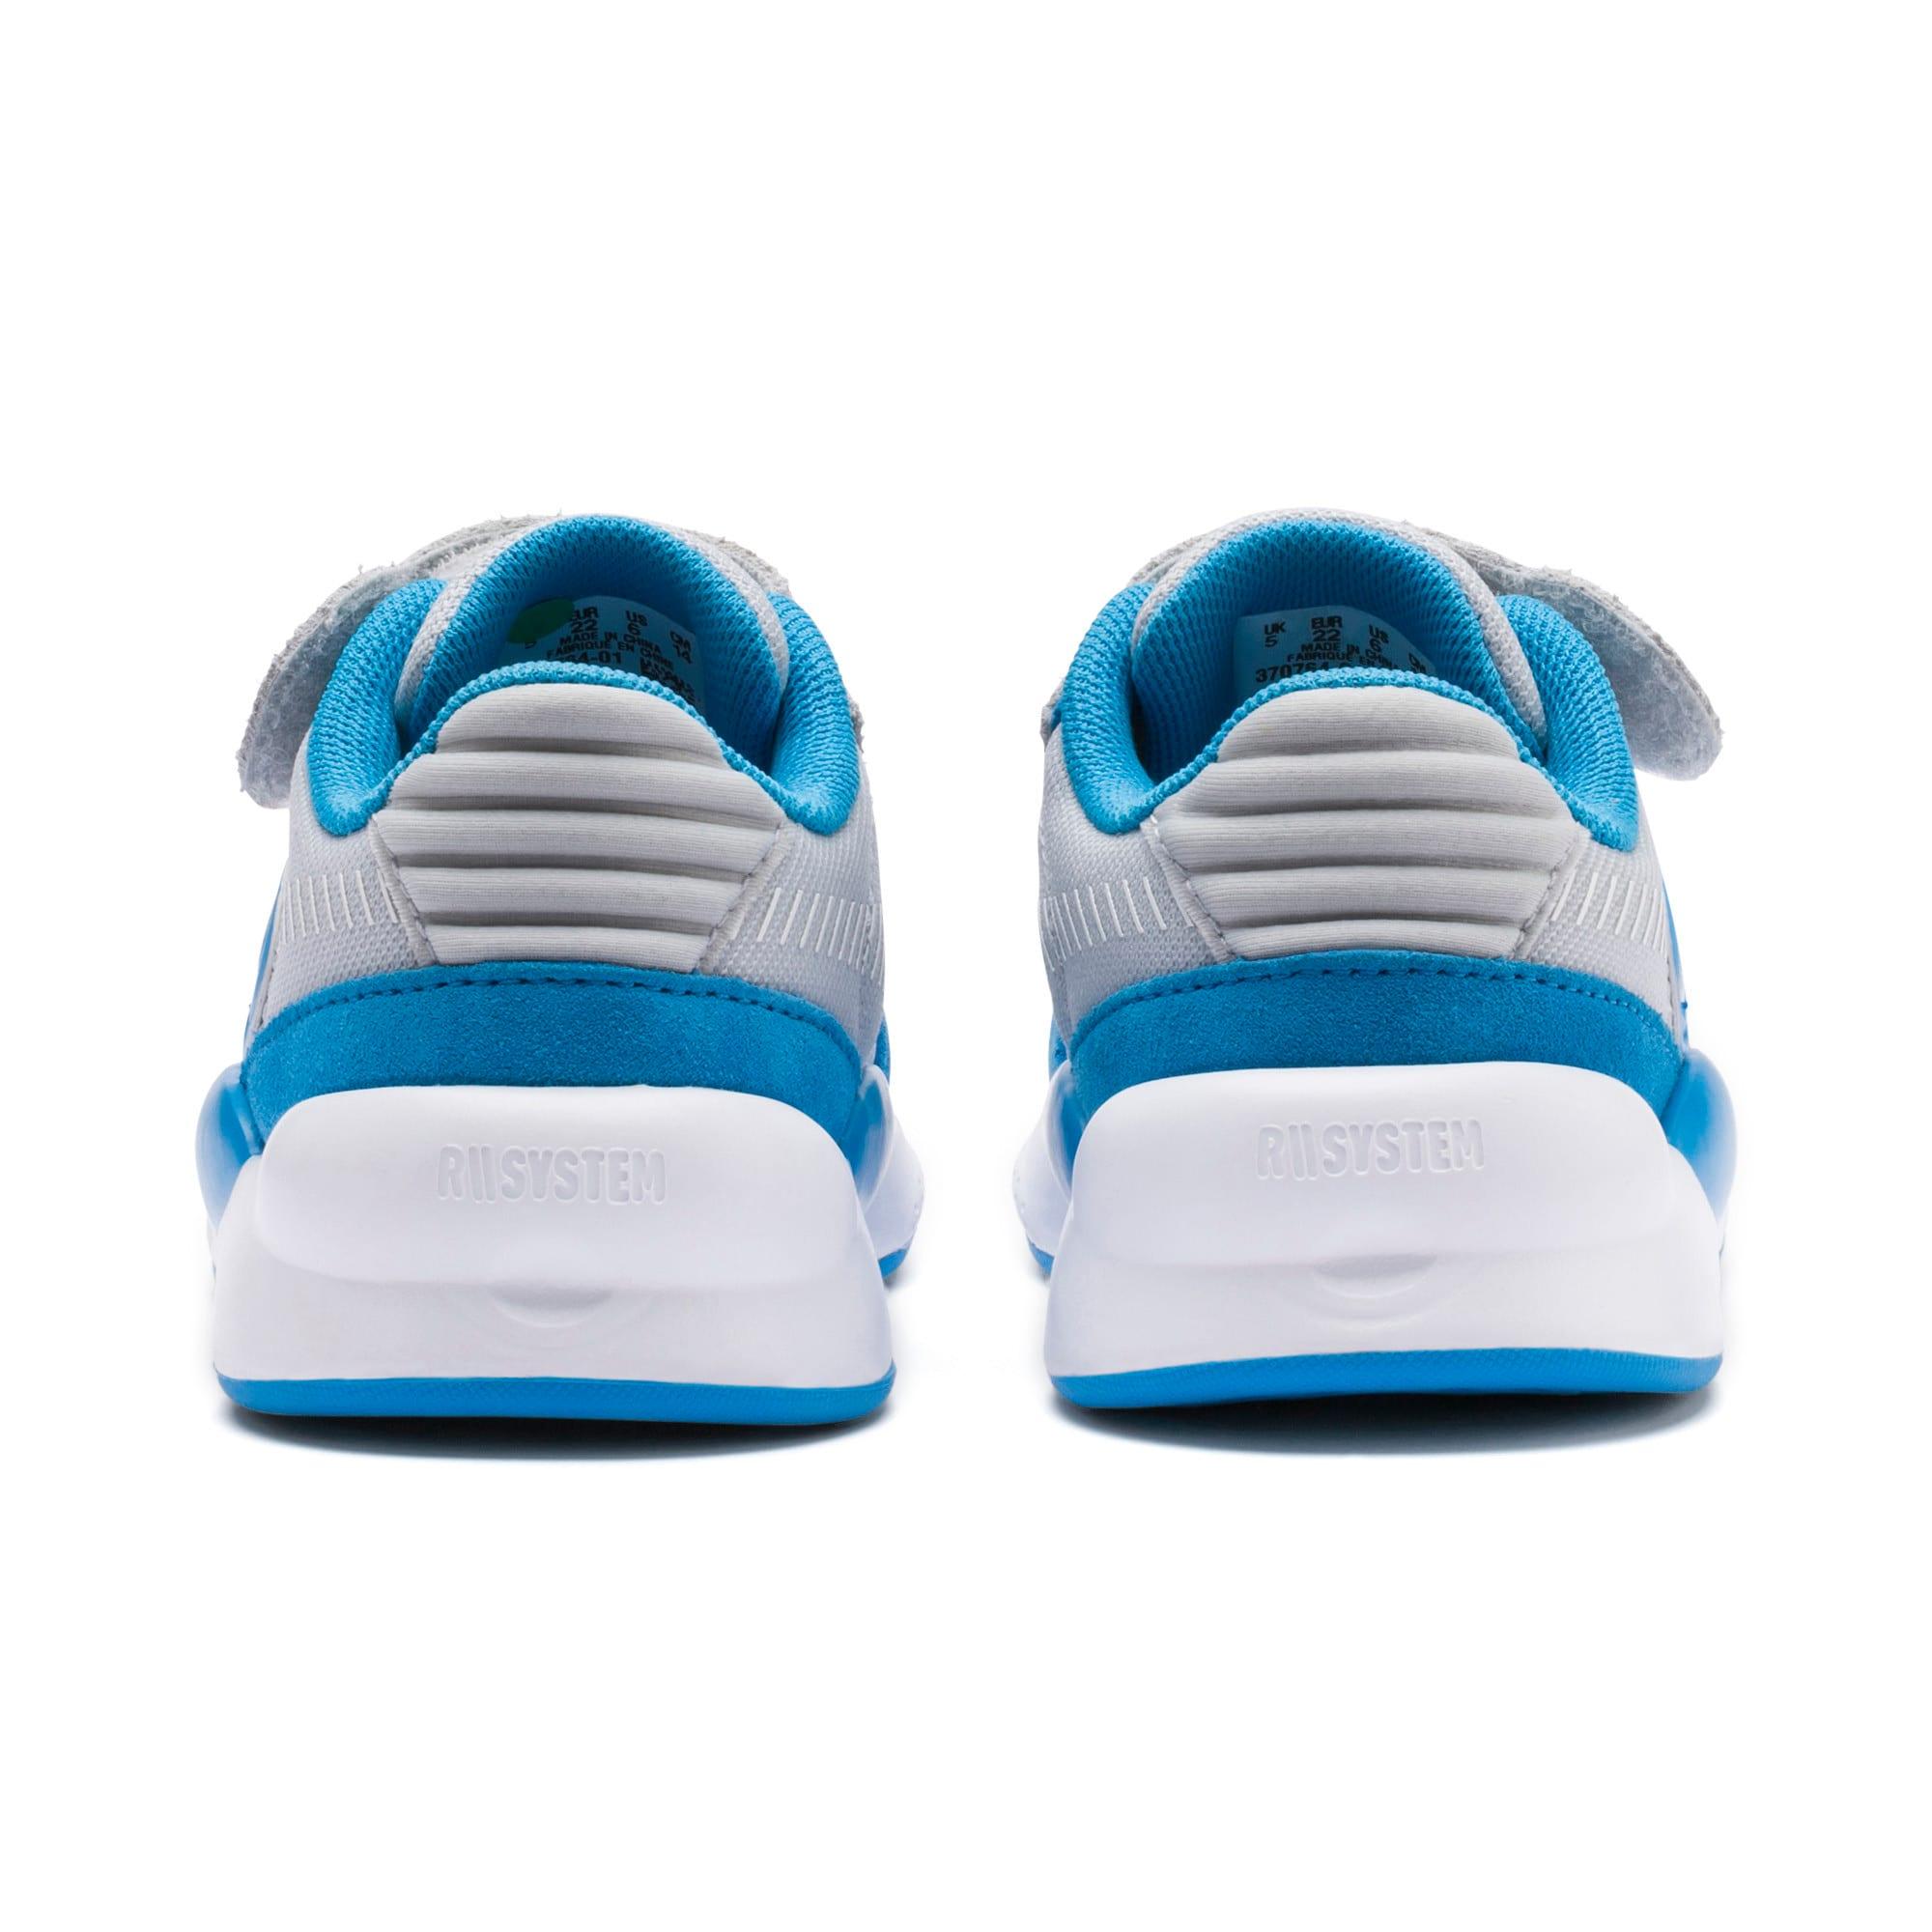 Thumbnail 3 of Sesame Street 50 RS 9.8 Babies' Trainers, Grey Dawn-Bleu Azur, medium